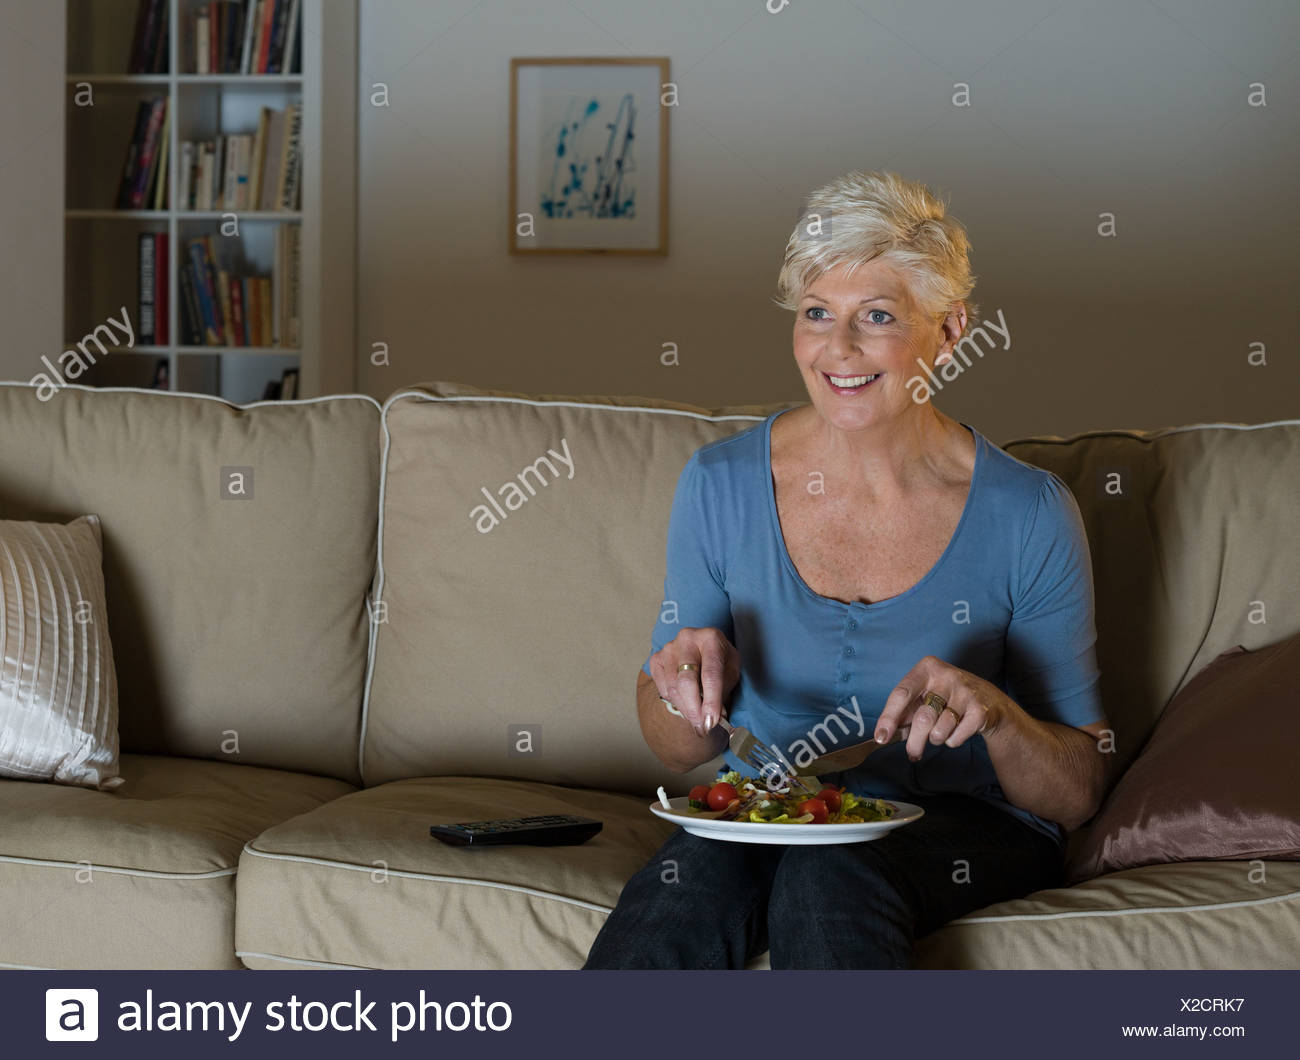 A senior woman having a tv dinner - Stock Image